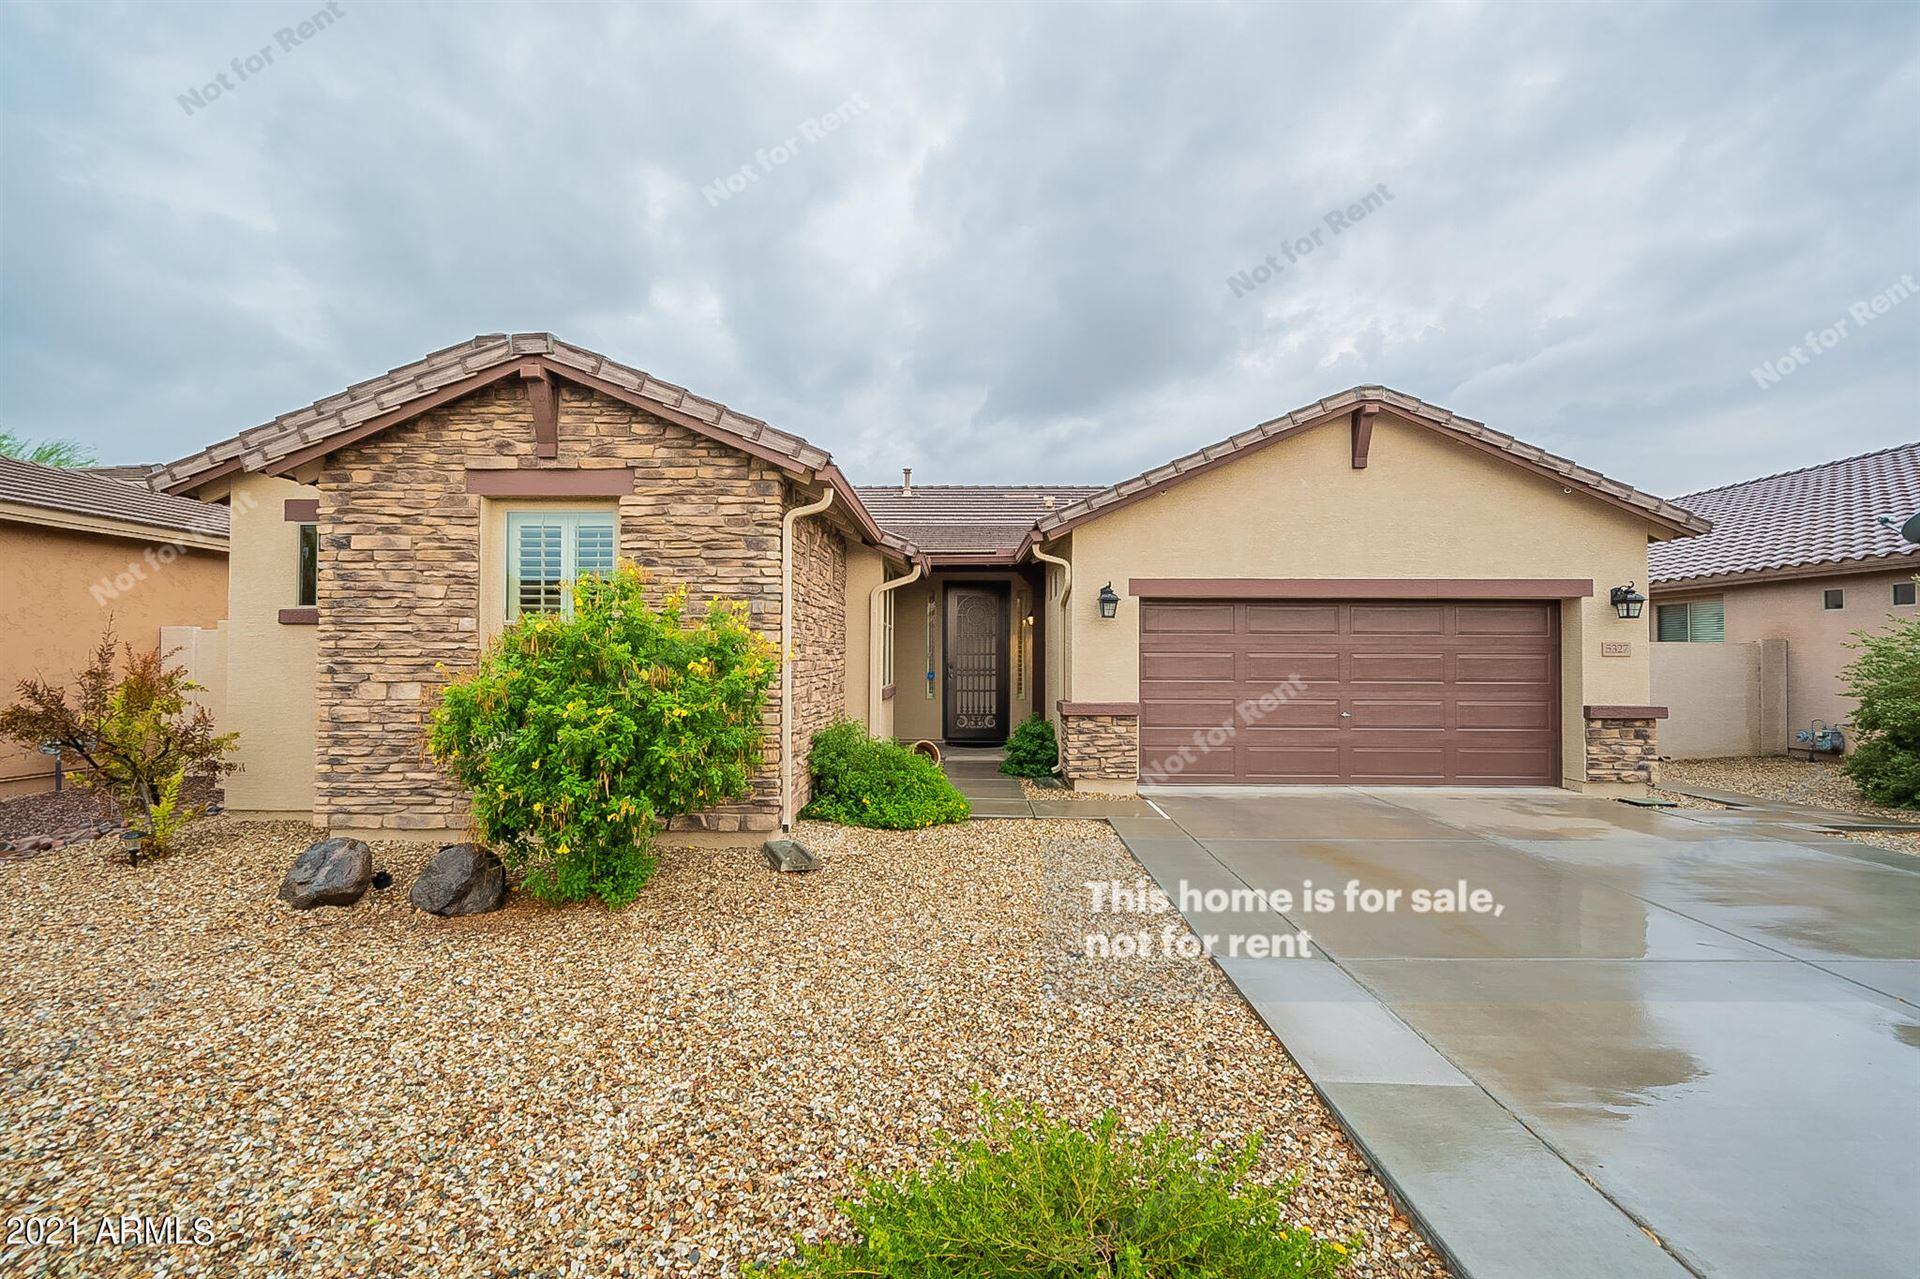 Photo of 5327 W ALLEN Street, Laveen, AZ 85339 (MLS # 6271659)